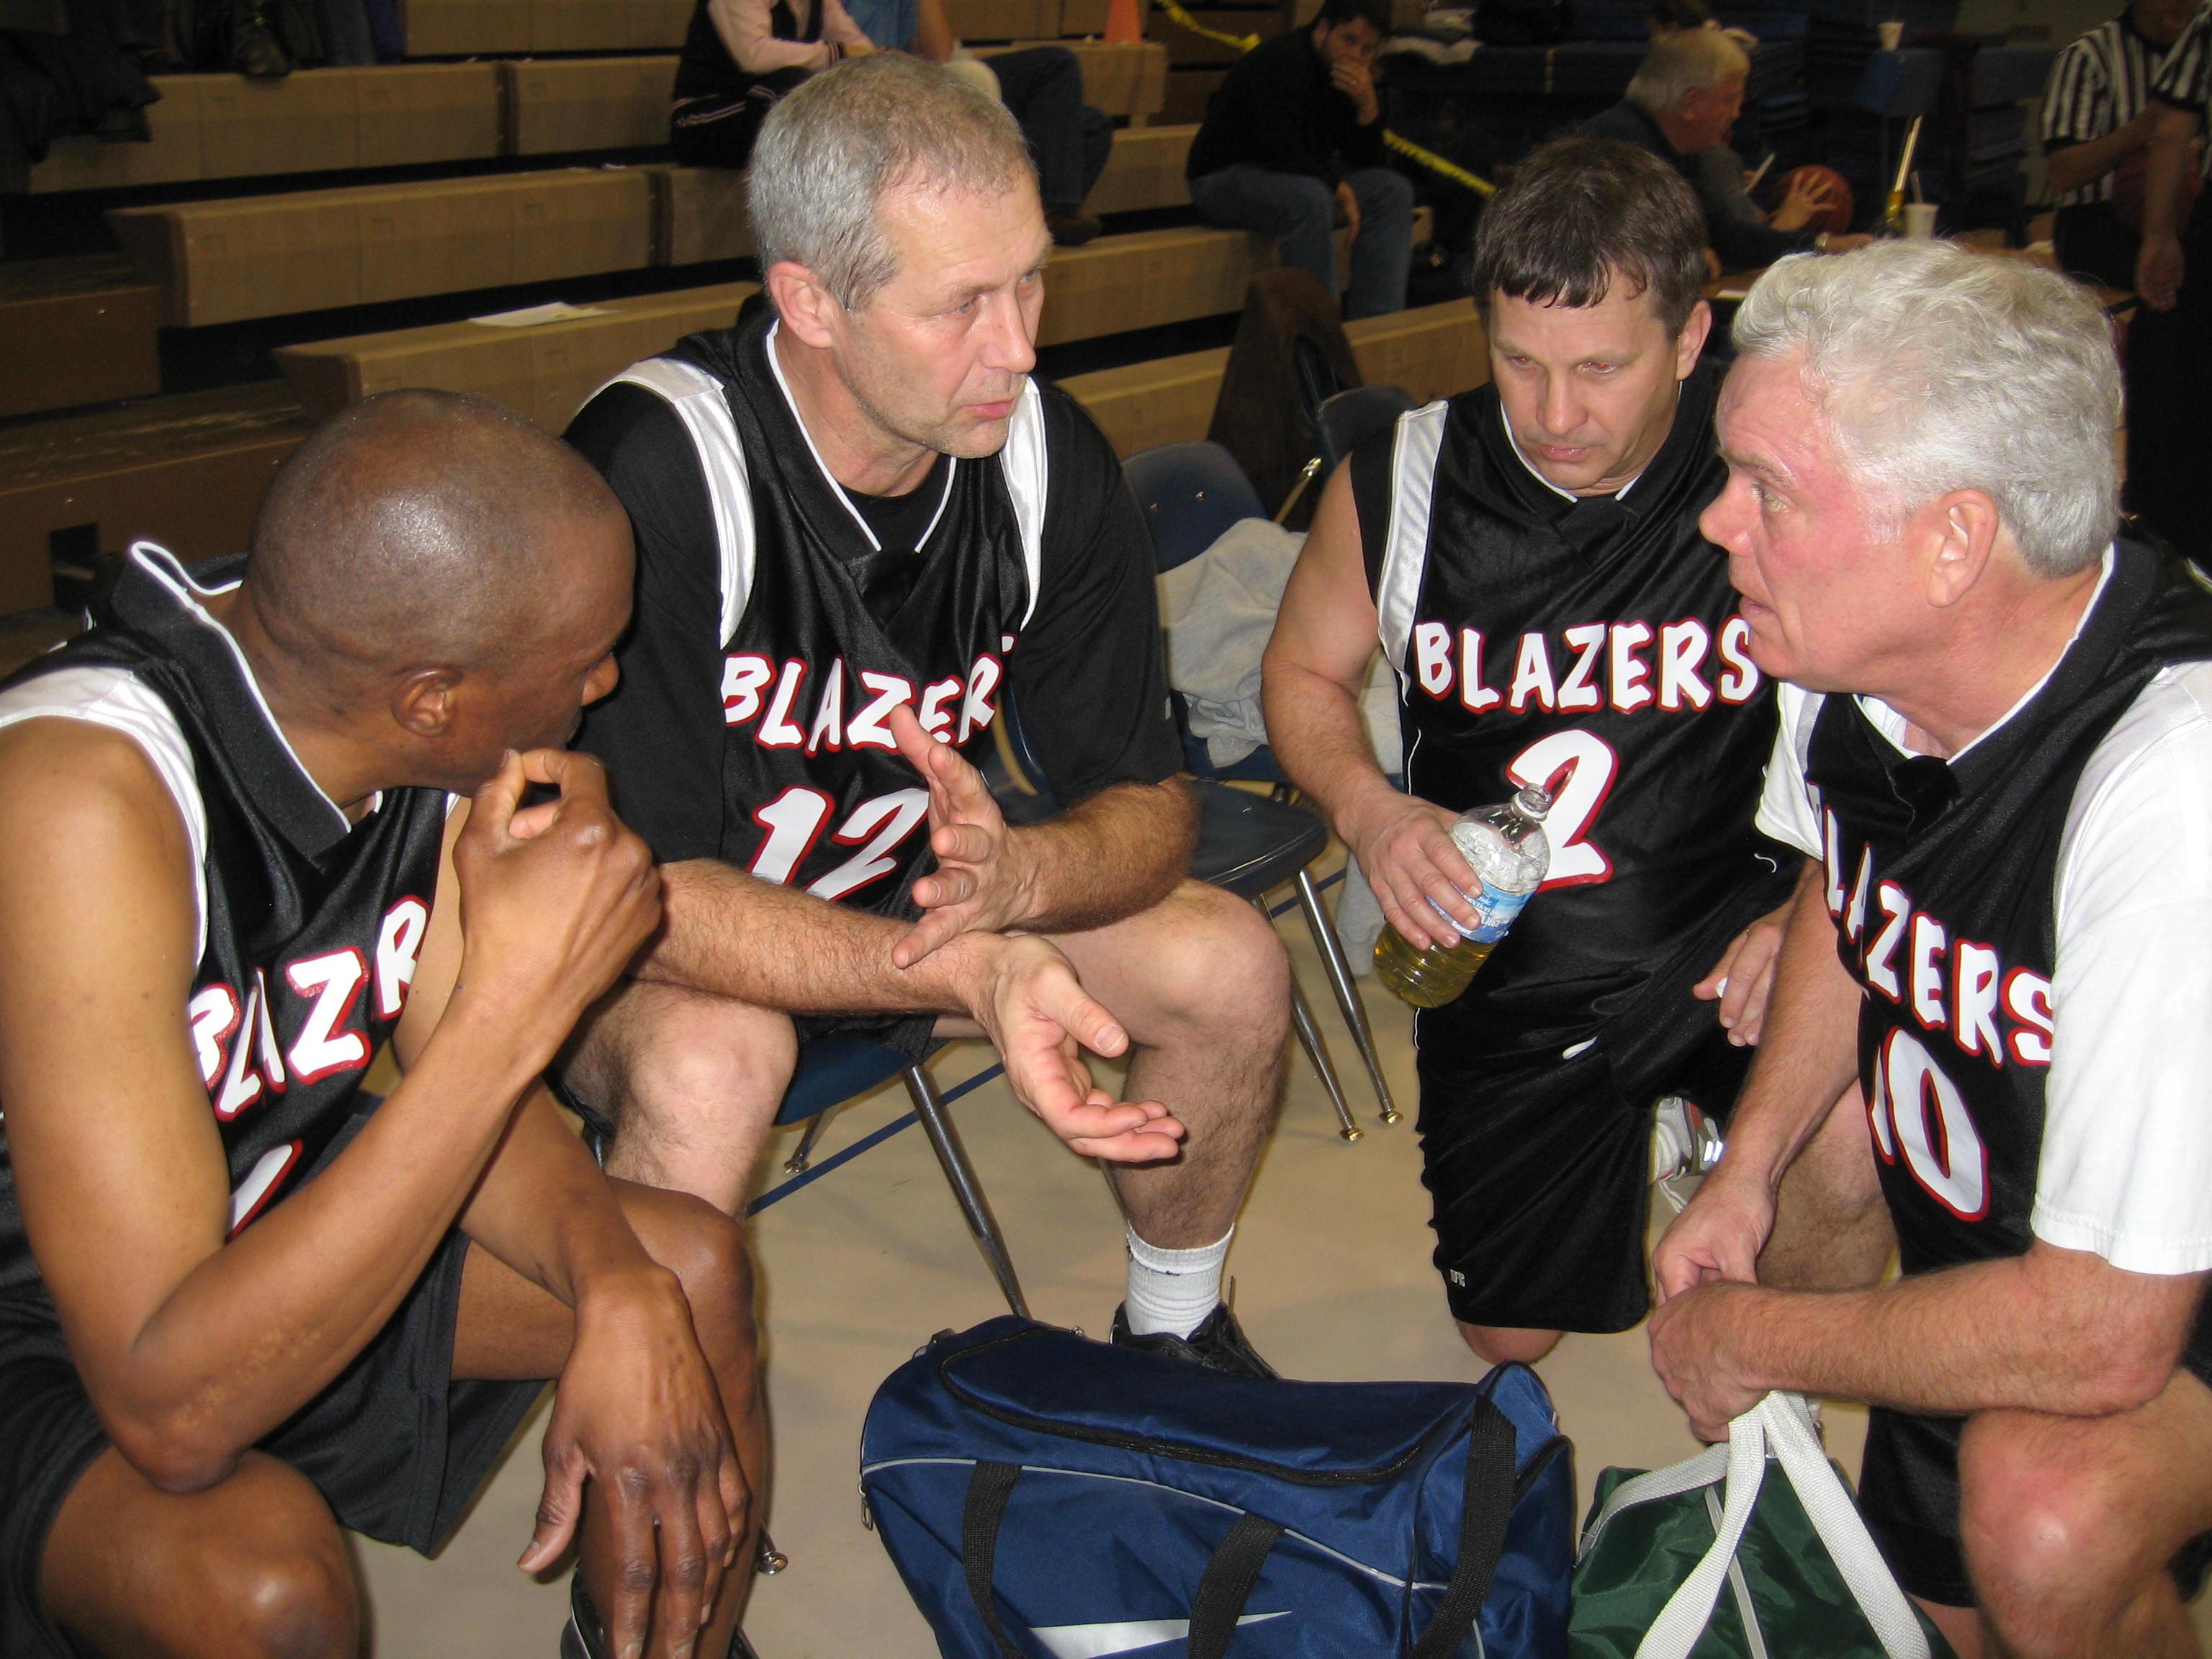 Blazers huddle 2009